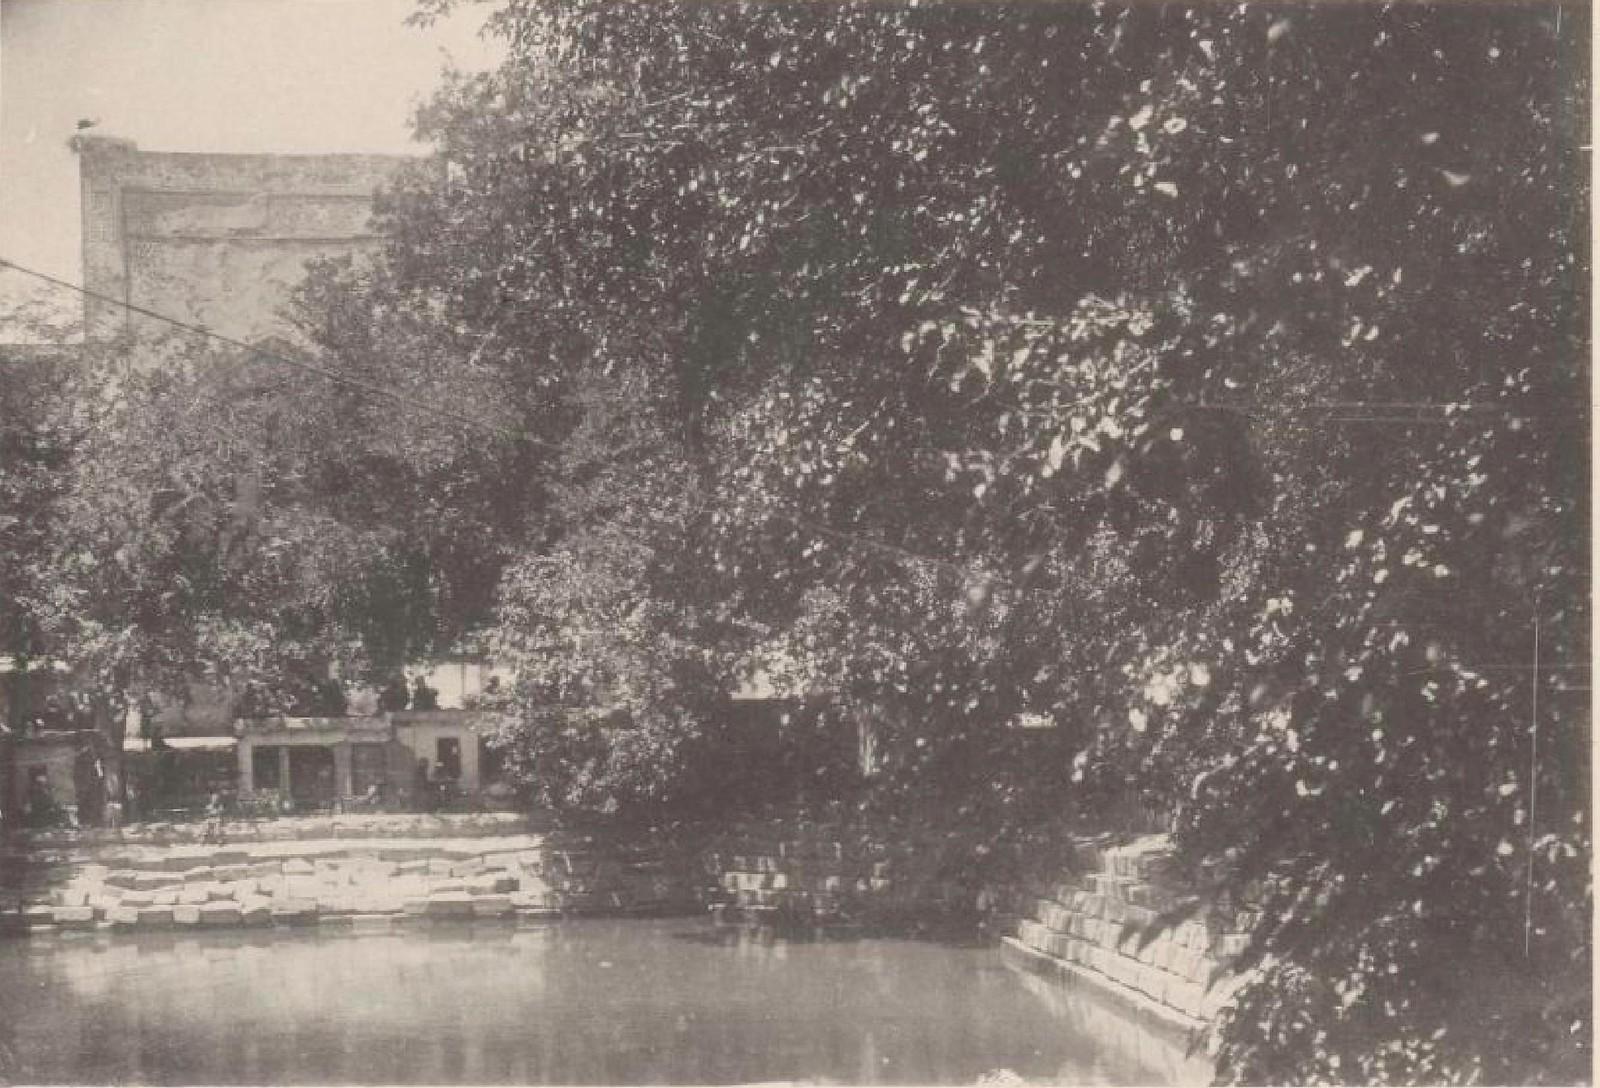 09. Бухара. Ляби-хауз, 26 мая 1898 года